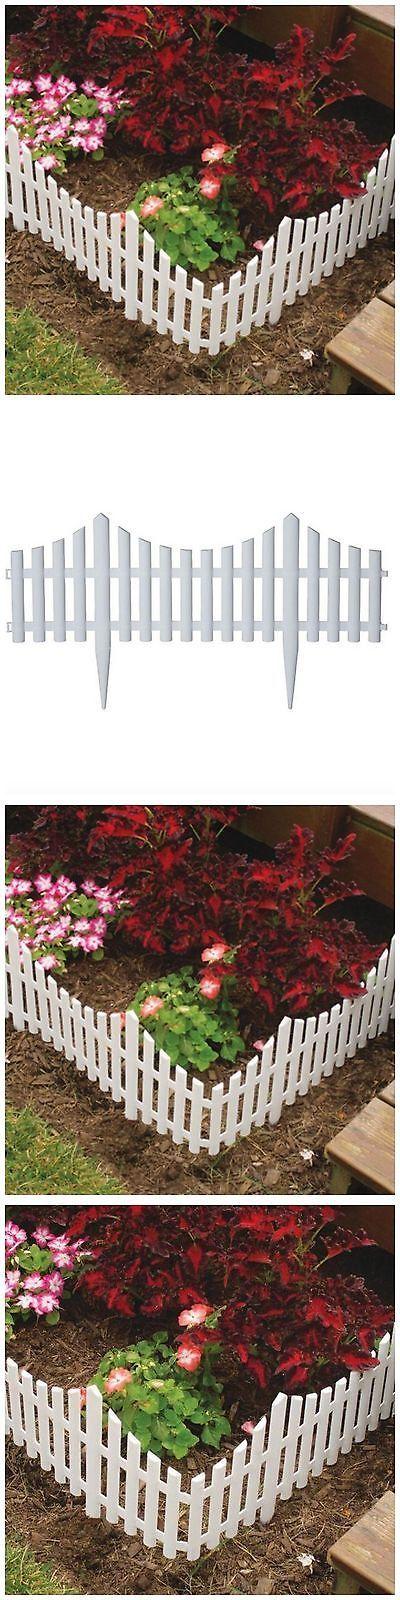 Fence Panels 139946: Plastic Garden Fence Border Decor Panels 18 Pack Fencing Landscape Picket Edging -> BUY IT NOW ONLY: $67.82 on eBay!